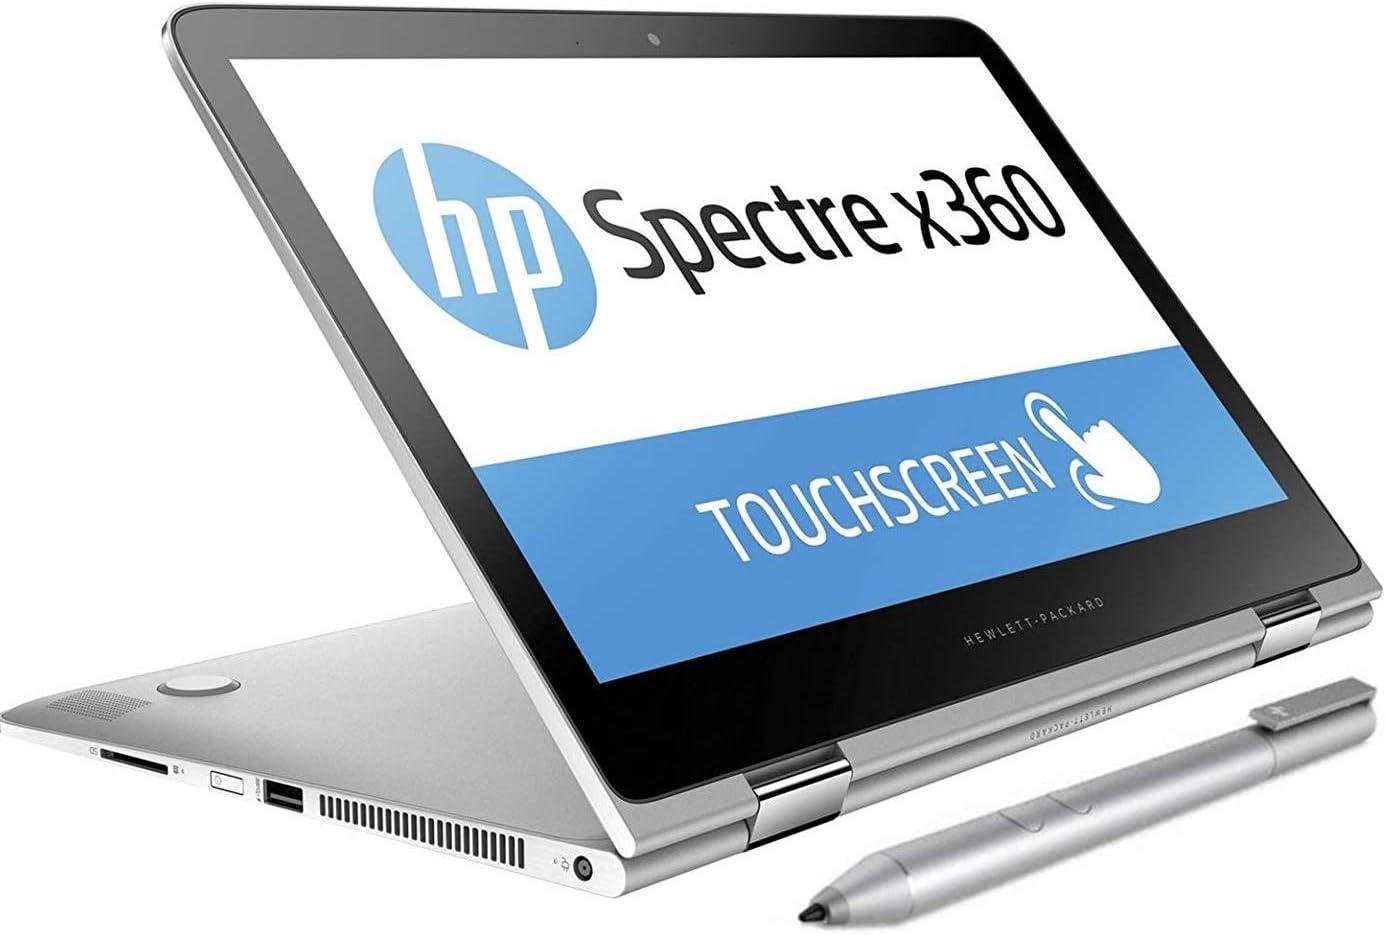 "2019 HP Spectre x360 13.3"" FHD Touchscreen 2-in-1 Laptop Computer: 8th Gen Intel Quad-Core i7-8550U Up to 4.0GHz/ 8GB RAM/ 256GB PCIe SSD/ 802.11AC WiFi/ Fingerprint Reader/ Active Pen/ Windows 10"